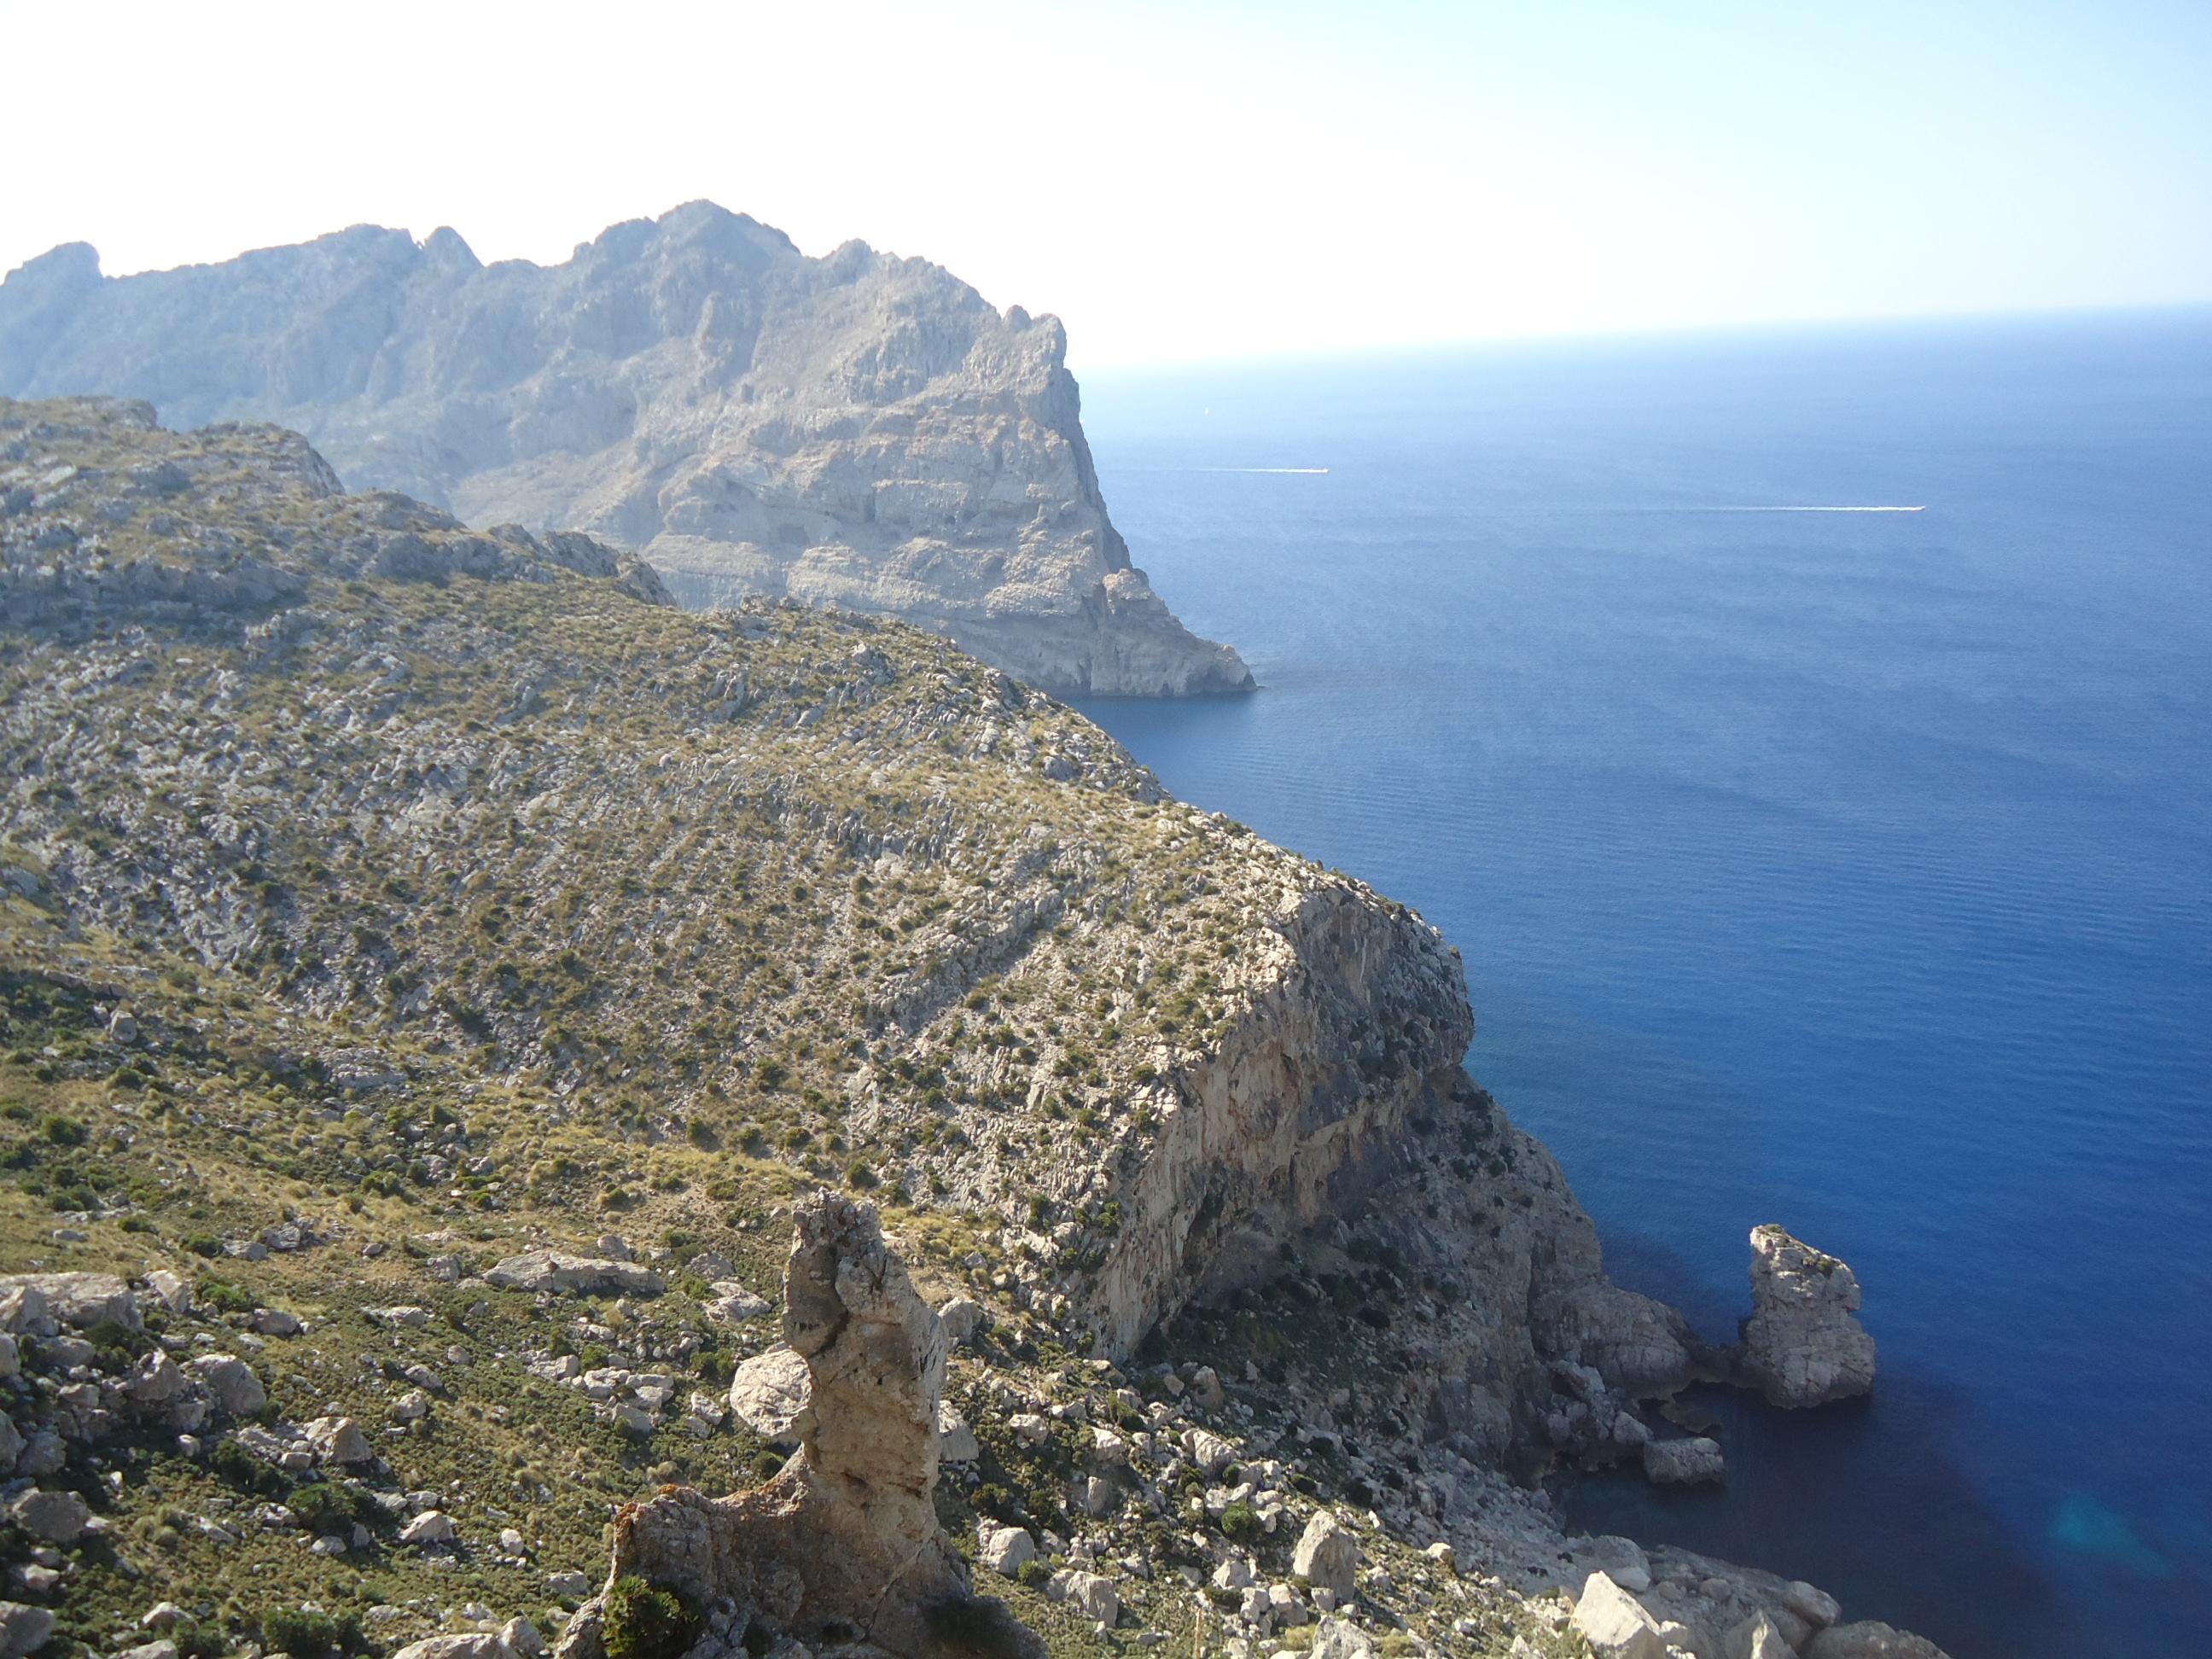 Mallorca baleares images - Mallorca islas baleares ...